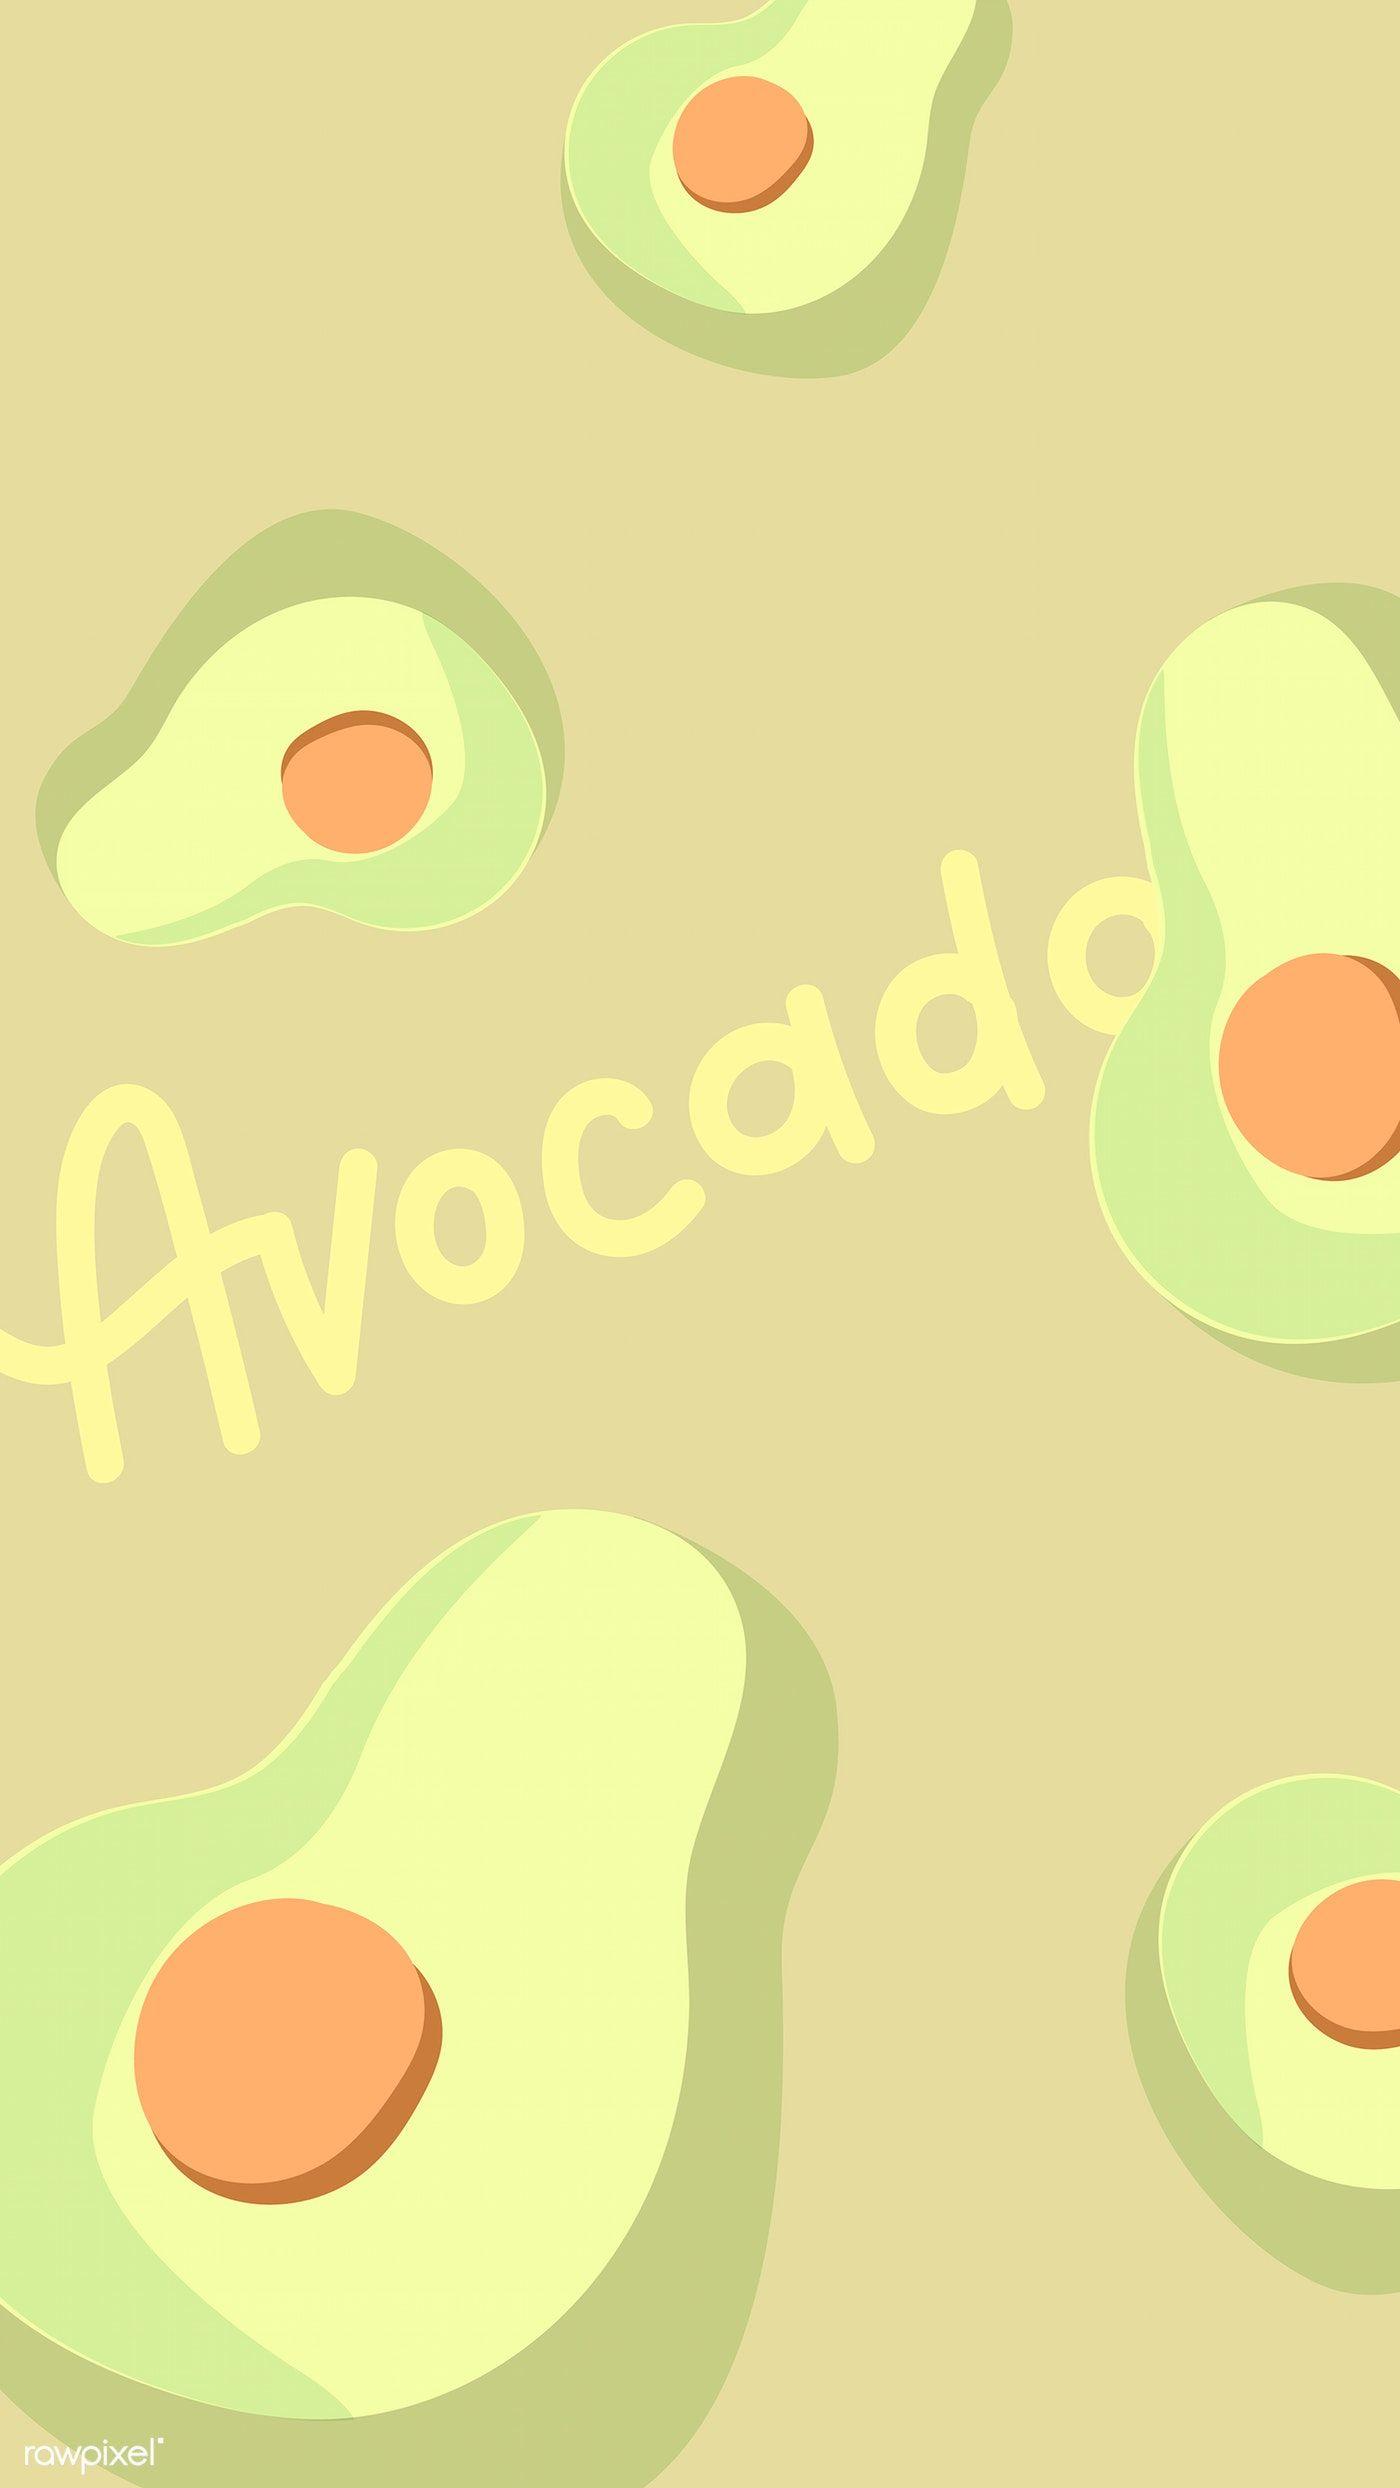 Avocado Art Print Avocado Print Avocado Wall Art Avocado Gift Nursery Wall Art Nursery Decor Gift For Her Nursery Print Avocados Avocado Art Cute Wallpapers Aesthetic Art